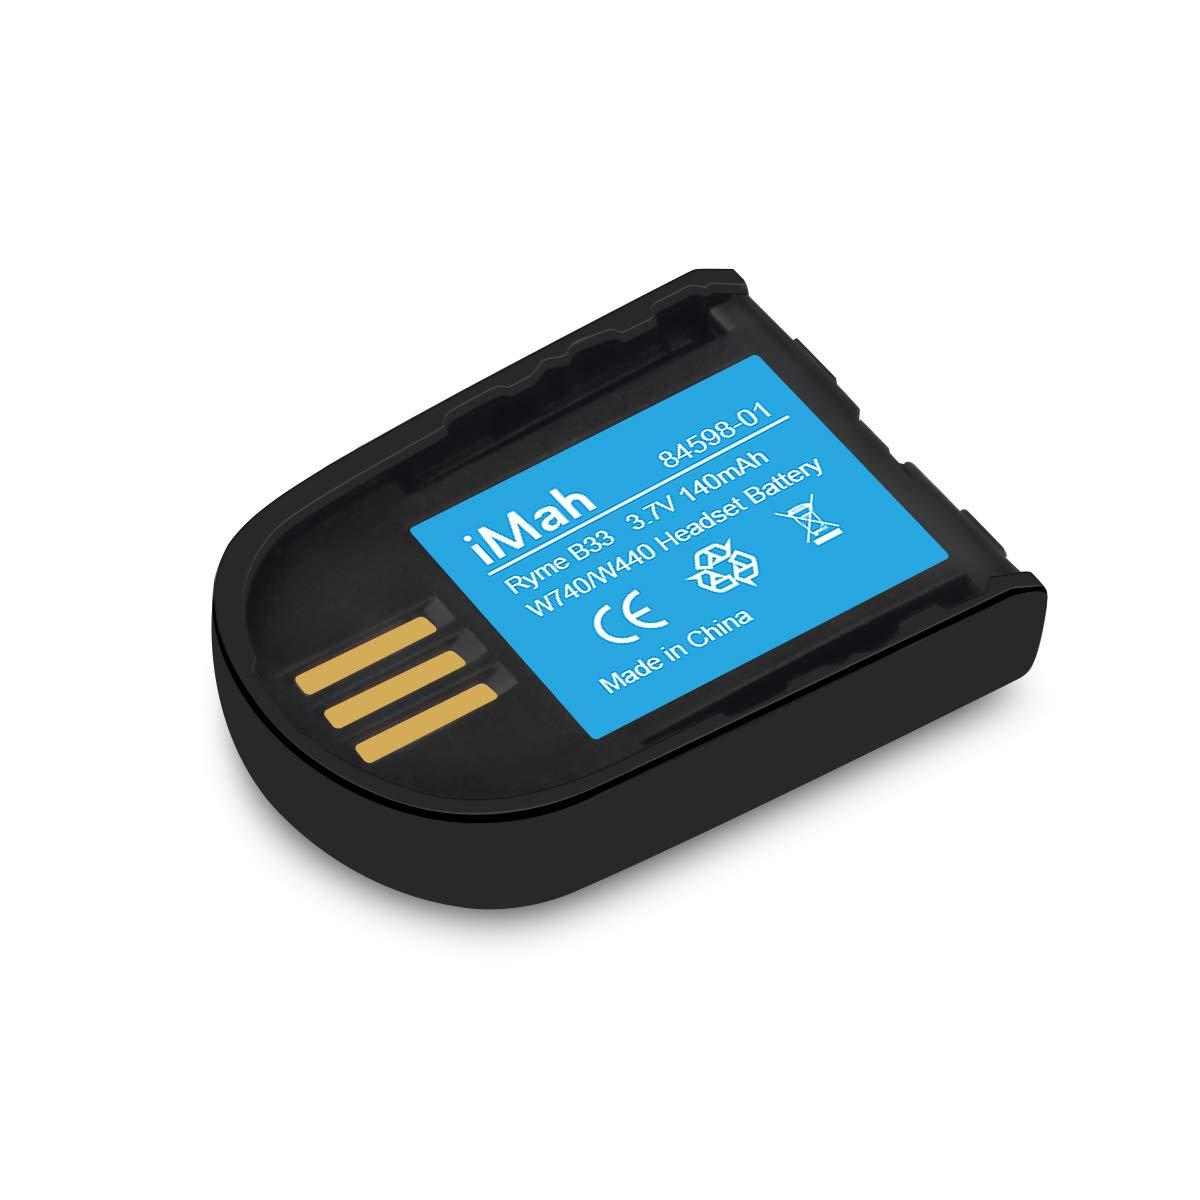 Replacement 84598-01 Battery for Plantronics 82742-01 Headset Battery Savi W440 W445 WH500 W740 W745 CS540XD Wireless Headsets by iMah